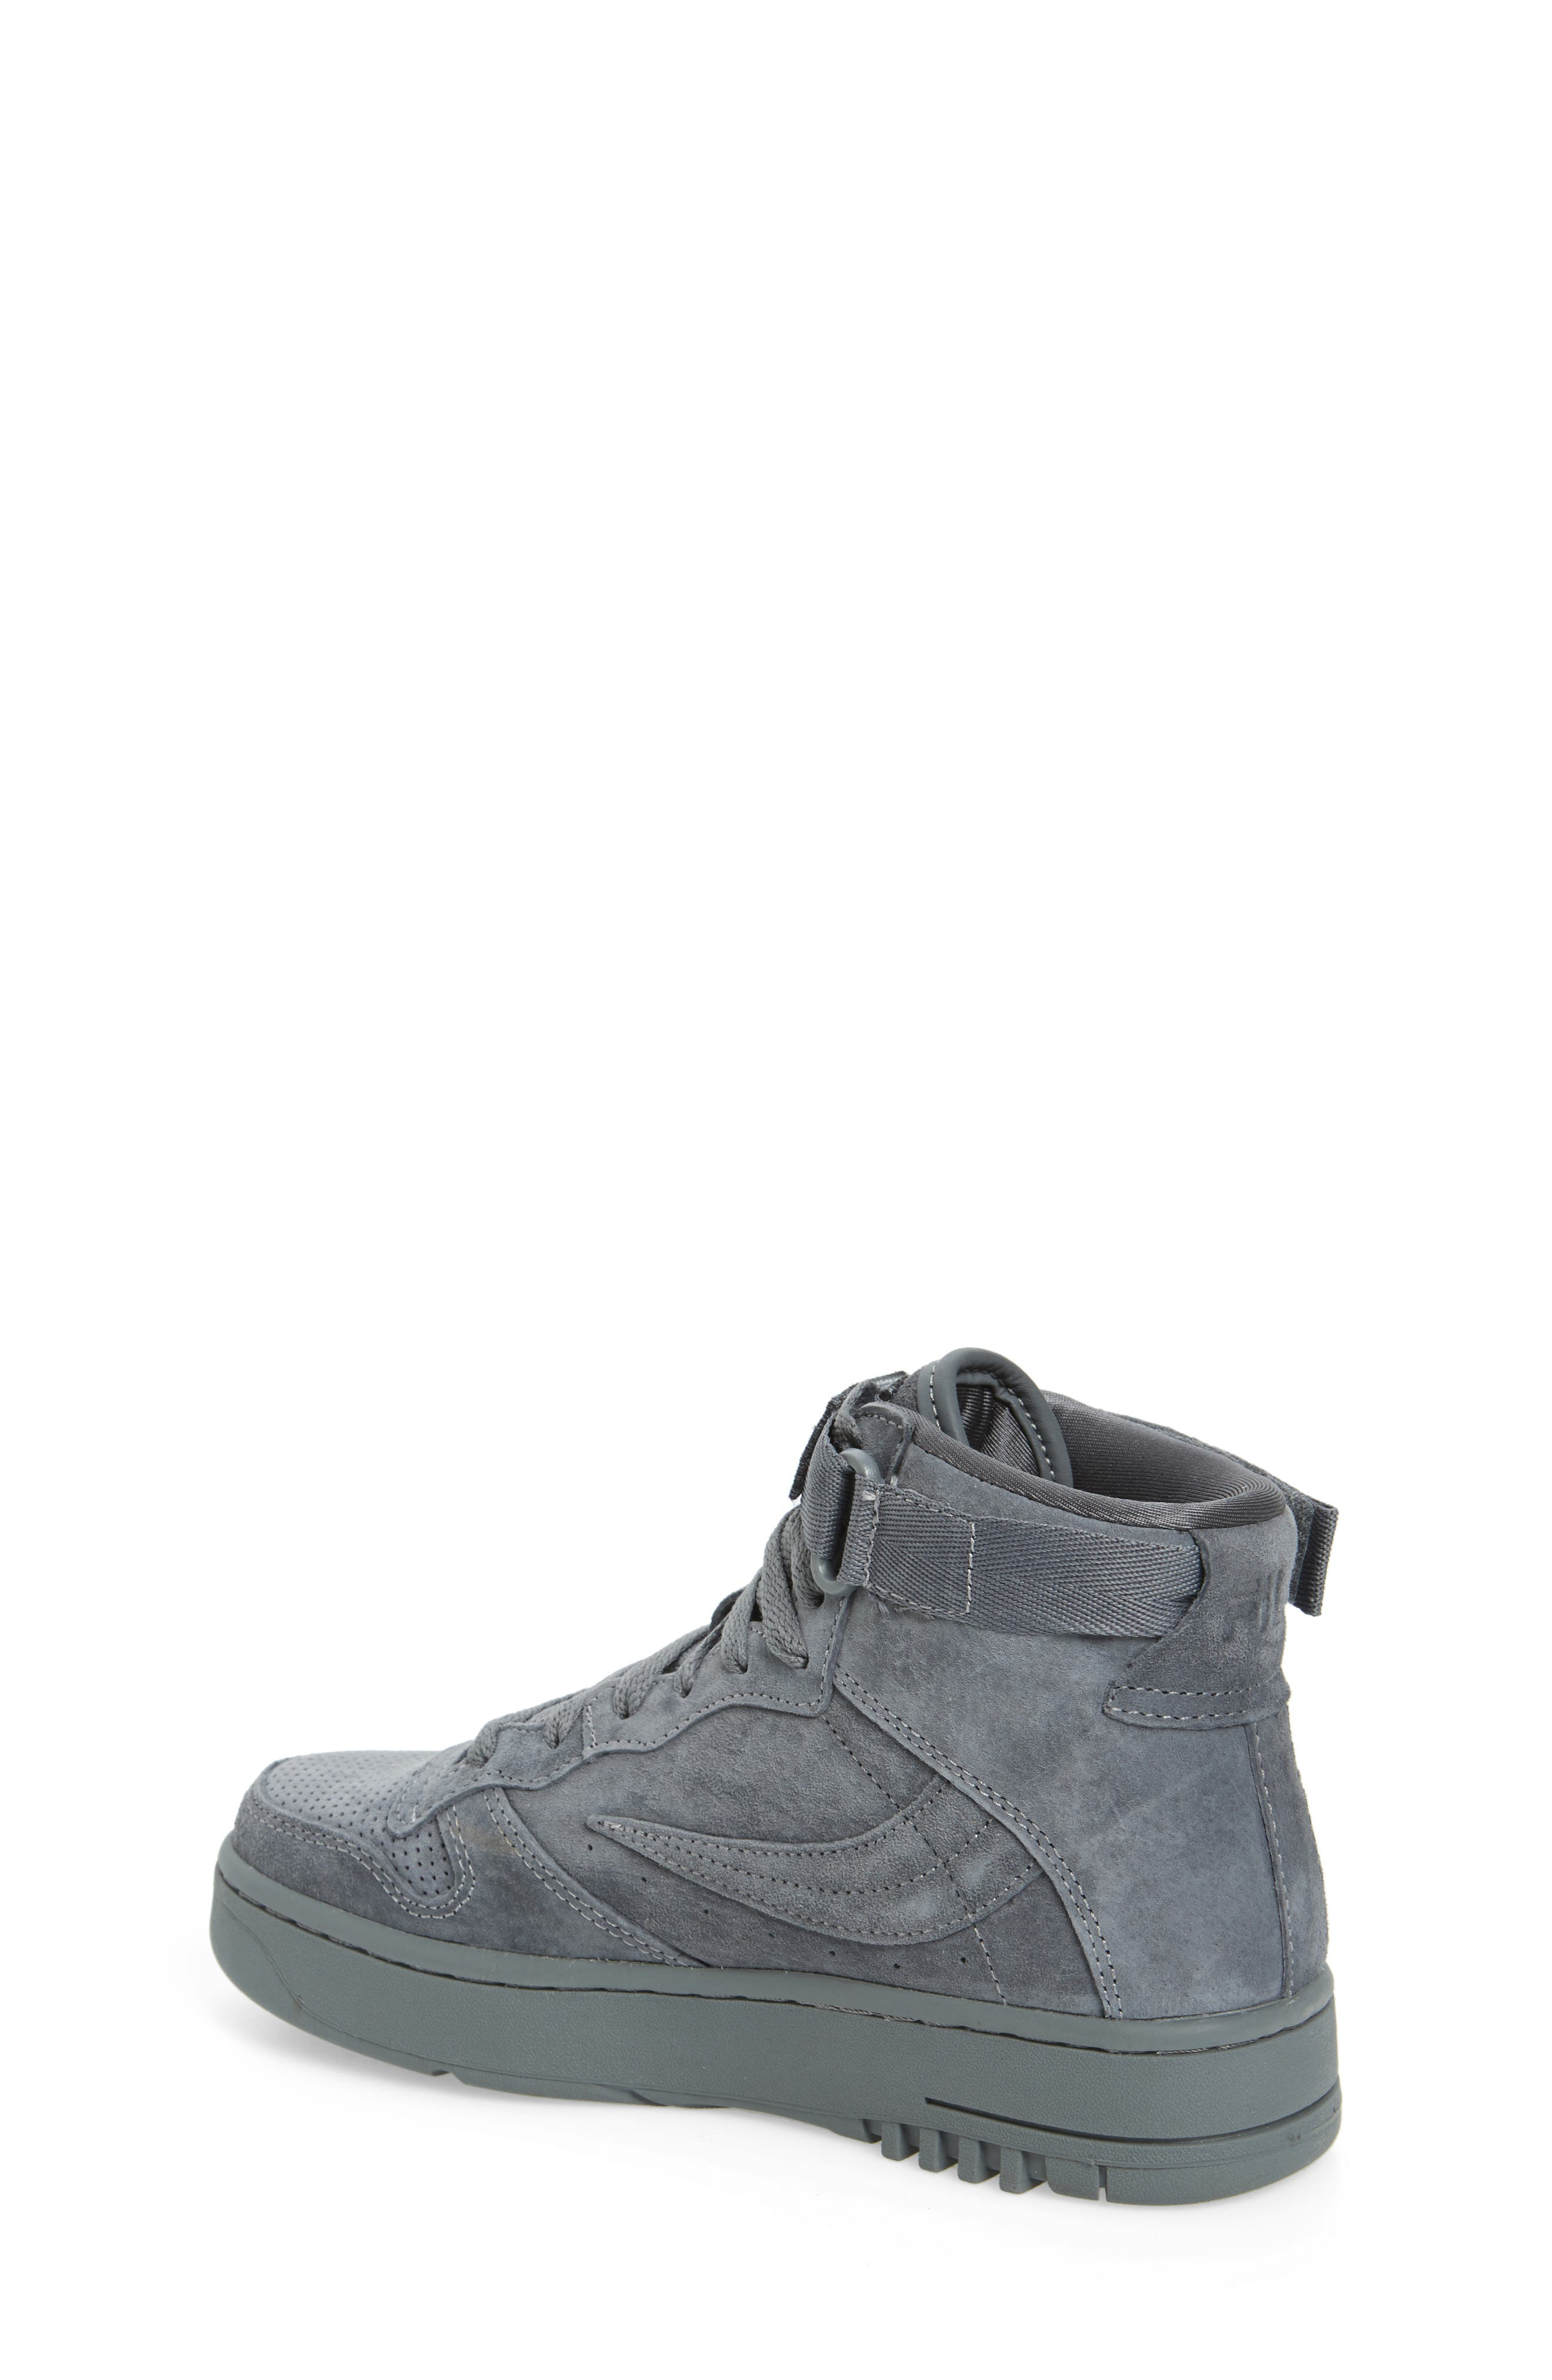 Alternate Image 2  - Fila USA FX-100 High Top Sneaker (Big Kid)